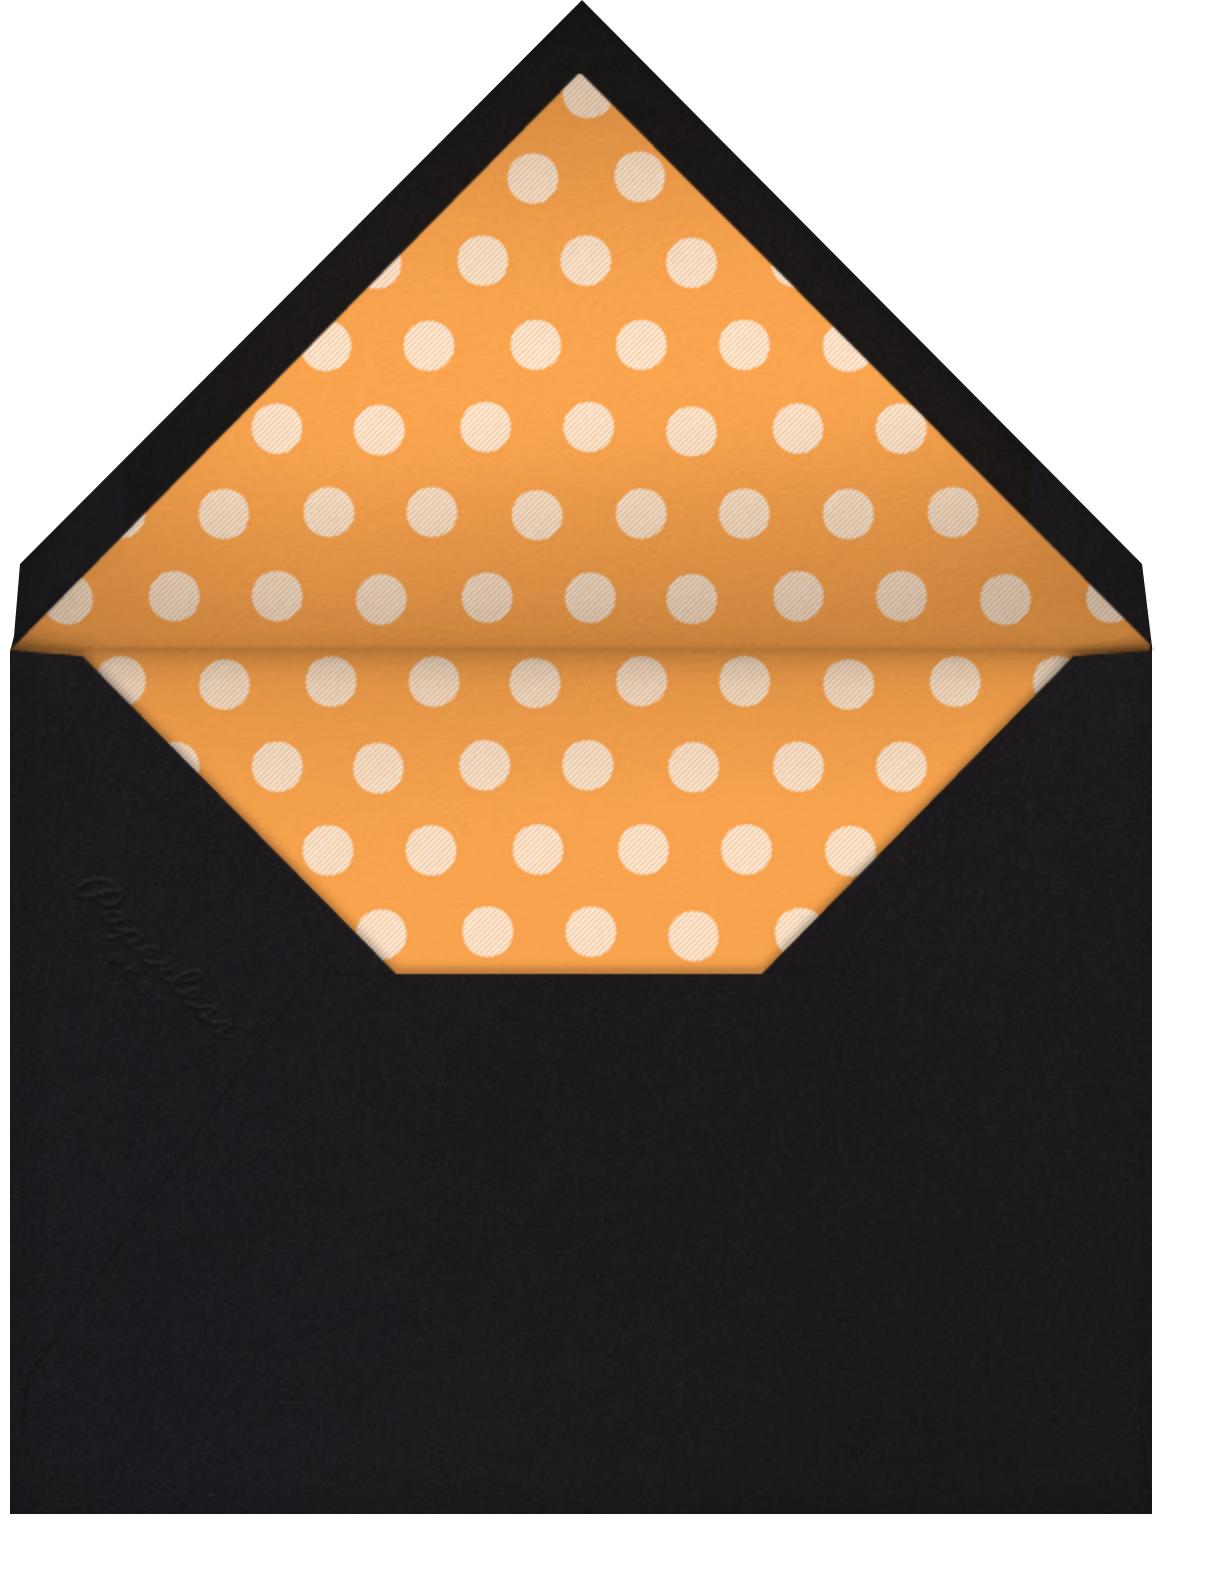 Costume Parade (Photo) - Paperless Post - Halloween - envelope back